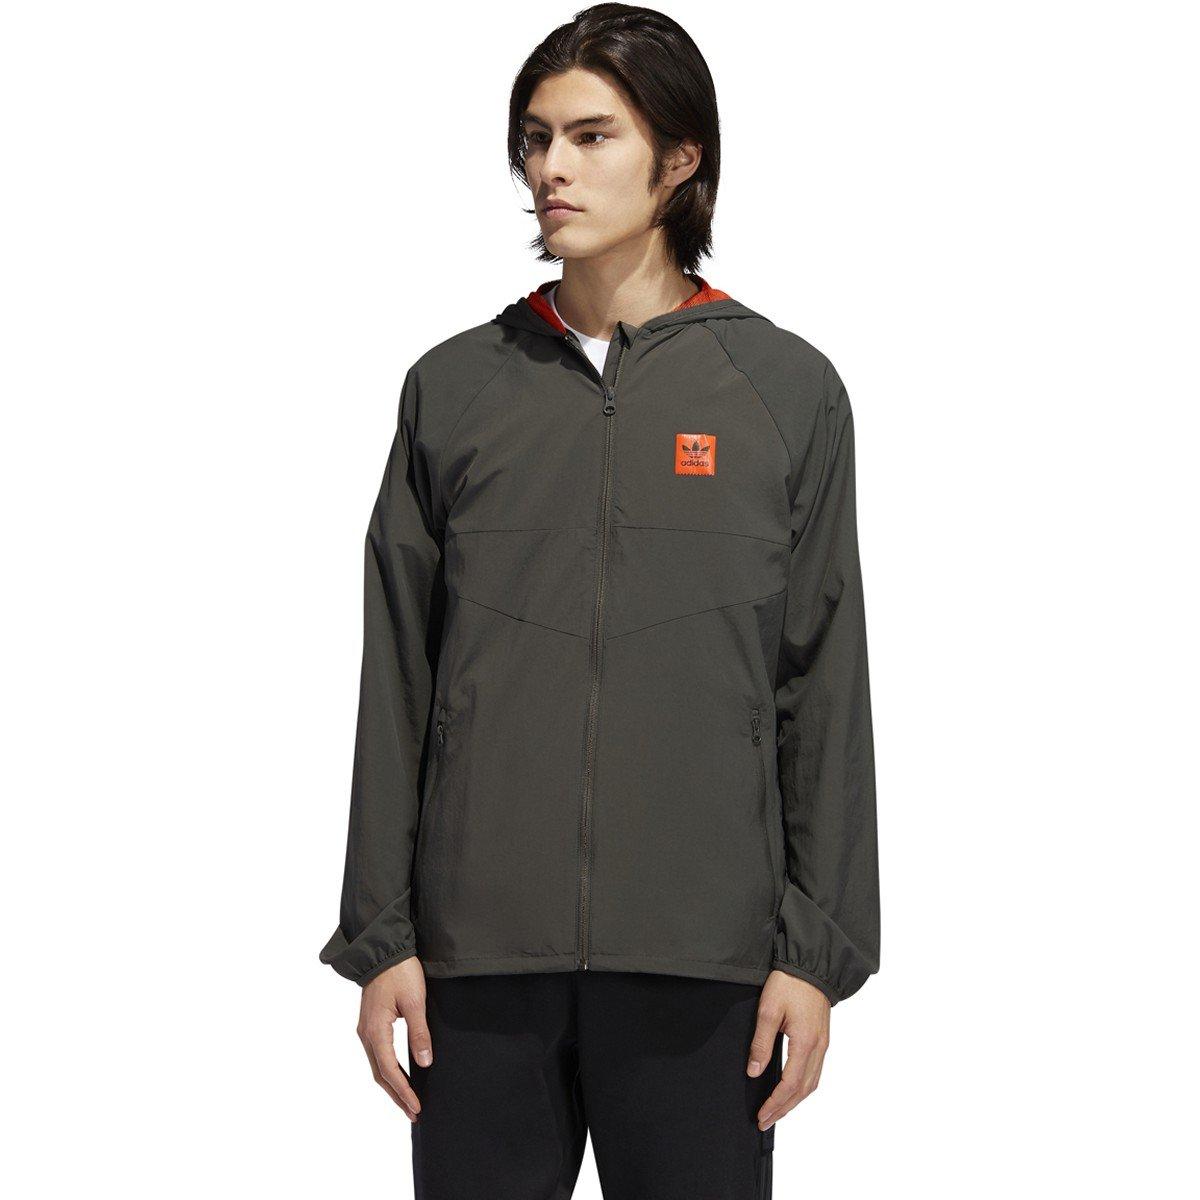 Adidas DEKUM PACKABLE WIND JACKET legend earth/active orange